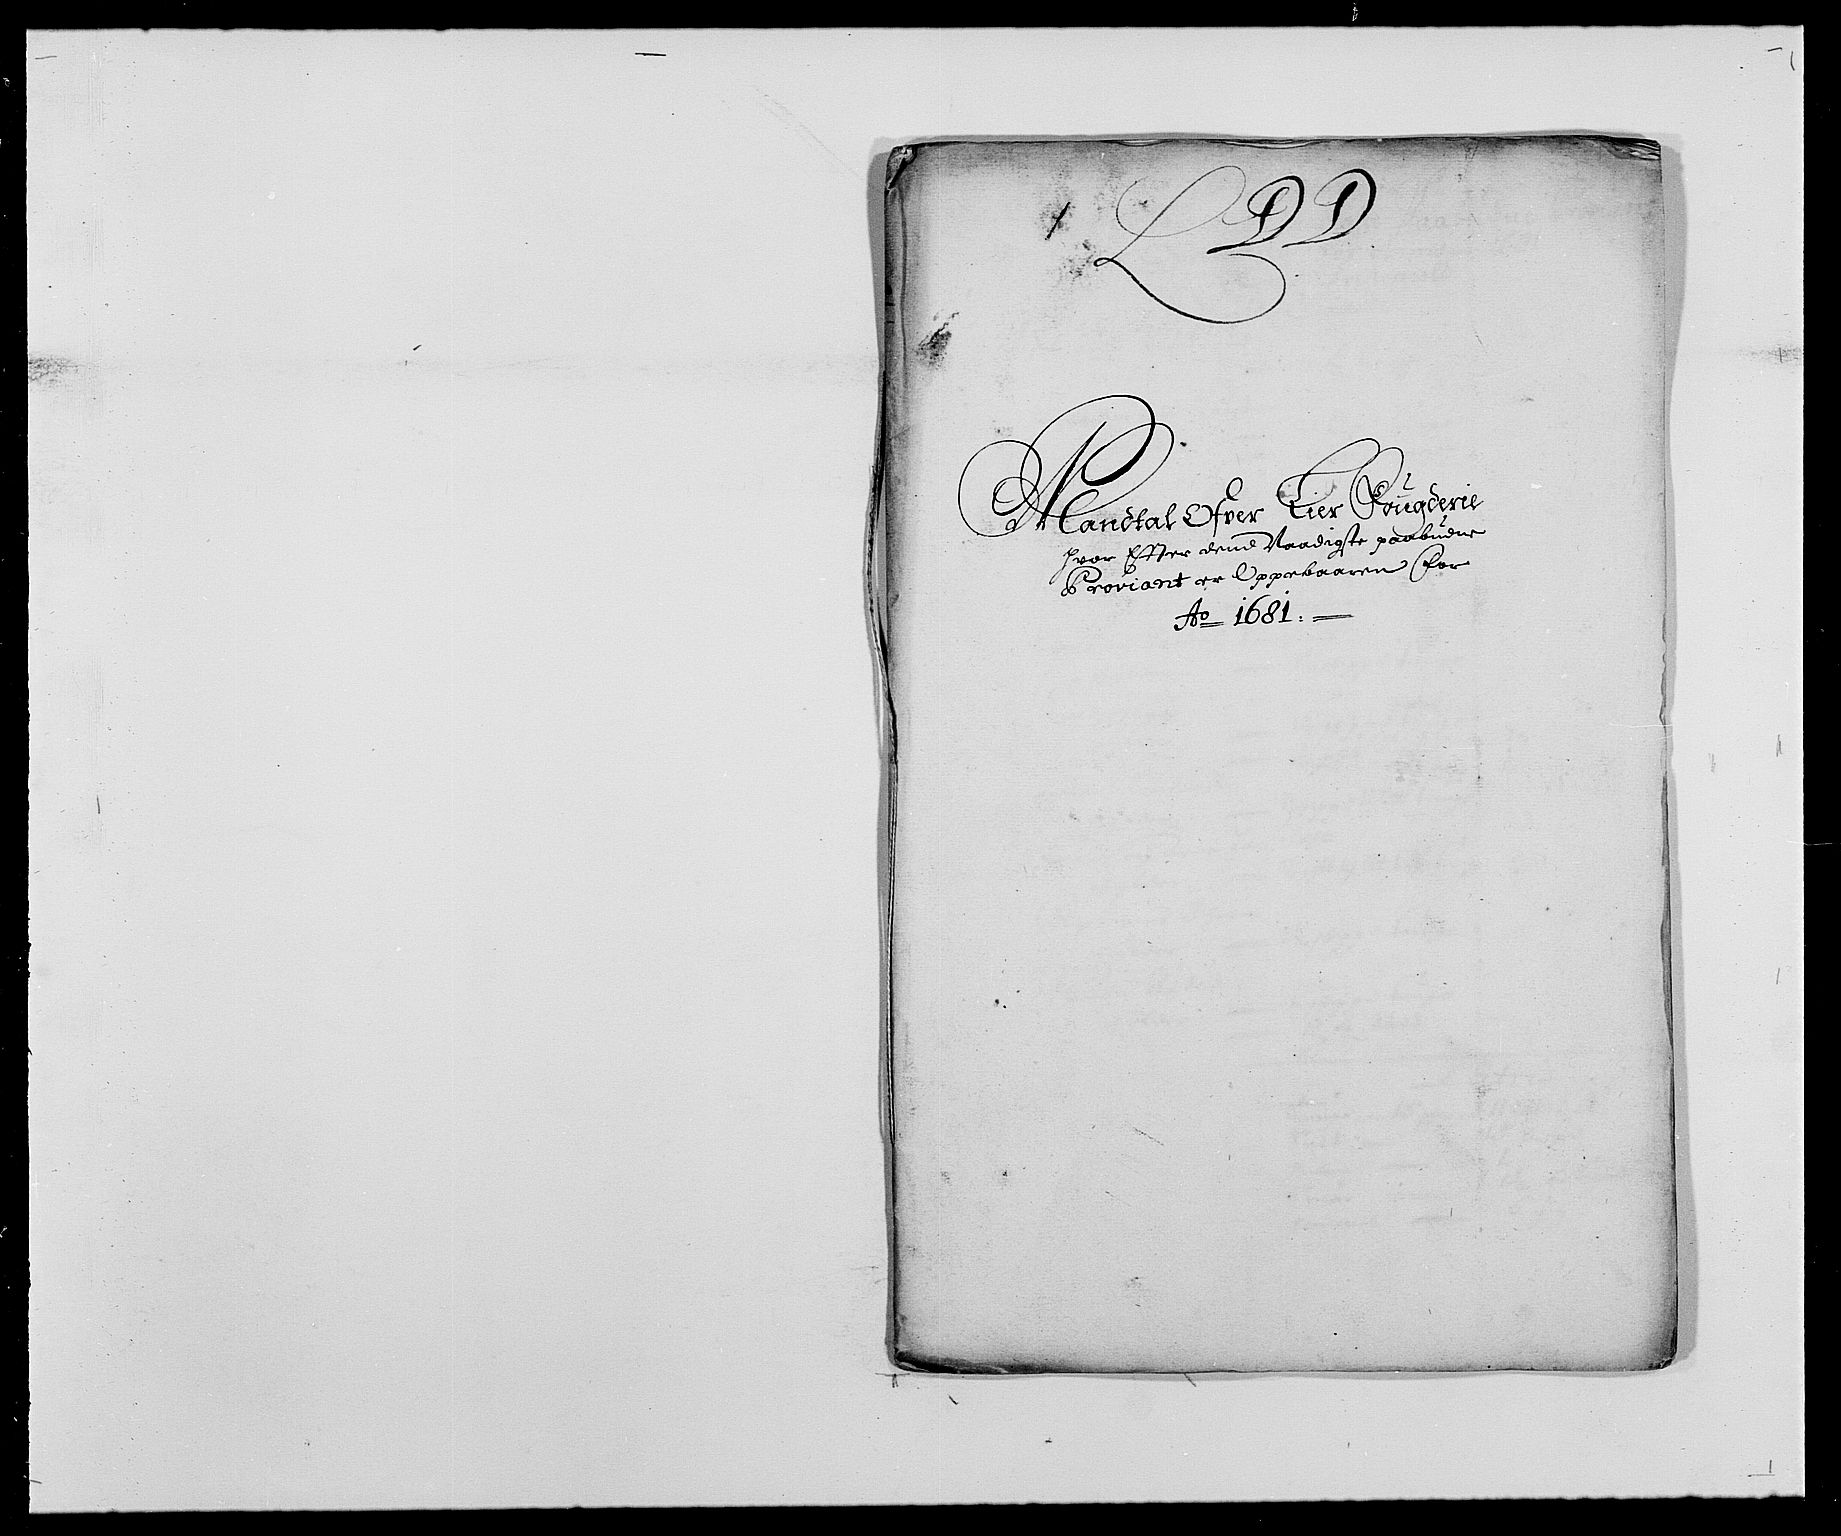 RA, Rentekammeret inntil 1814, Reviderte regnskaper, Fogderegnskap, R27/L1686: Fogderegnskap Lier, 1678-1686, s. 332